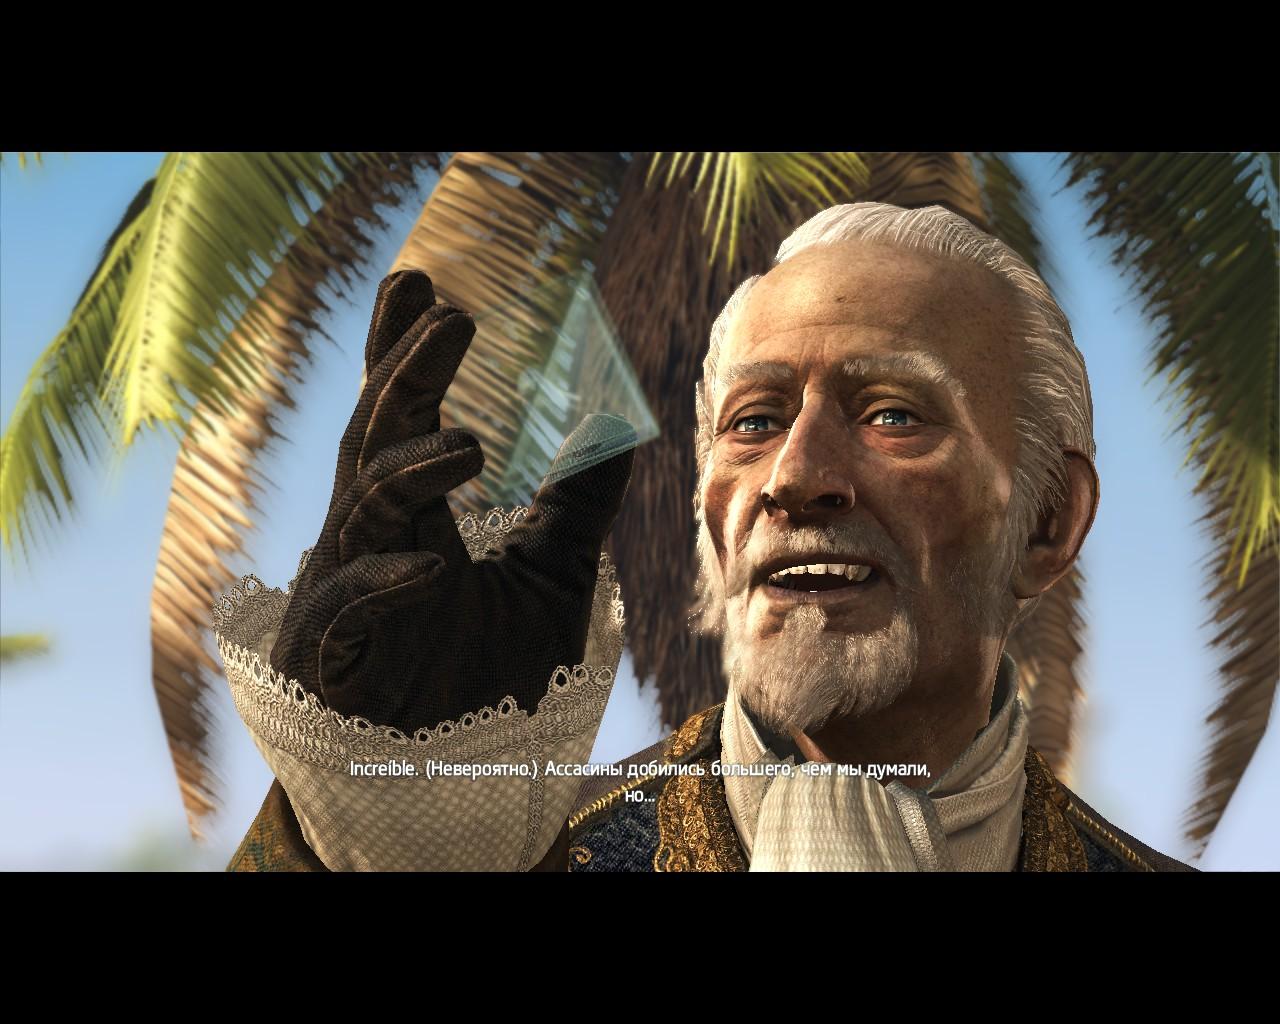 AC4BFSP 2014-02-22 00-05-43-92.jpg - Assassin's Creed 4: Black Flag